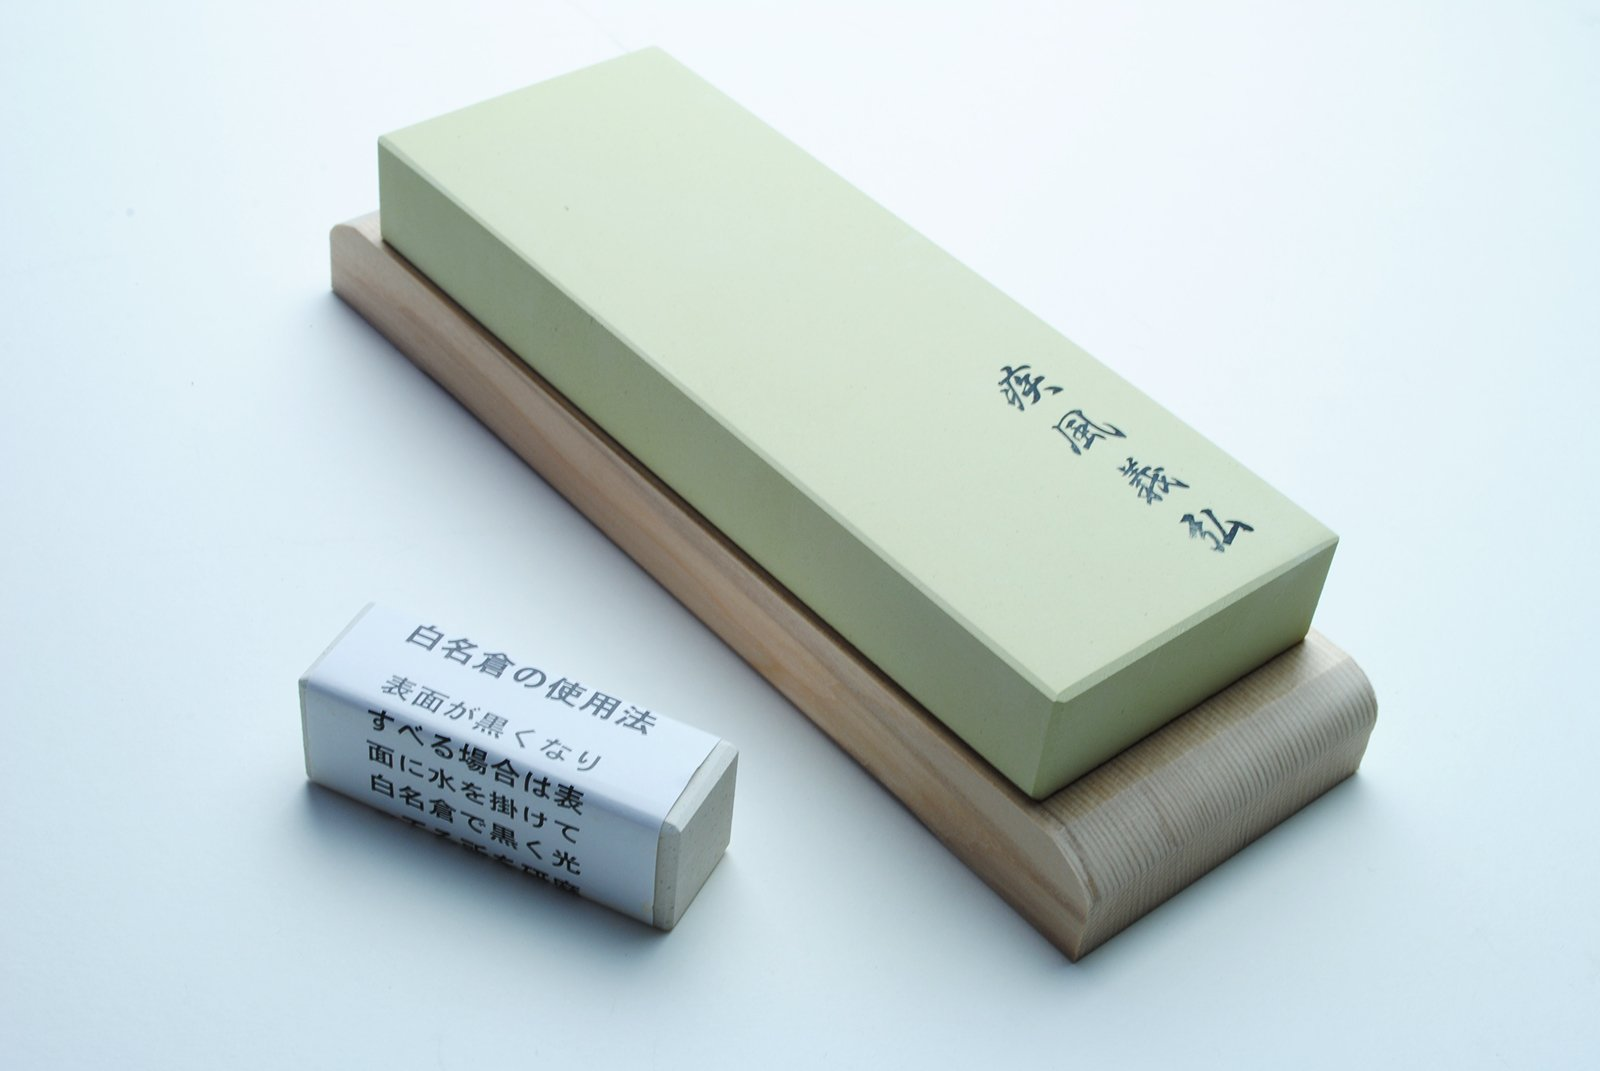 Yoshihiro Professional Grade Toishi Japanese Whetstone Knife Sharpener Water Stones #8000 Grit (Fine Finishing Stone)